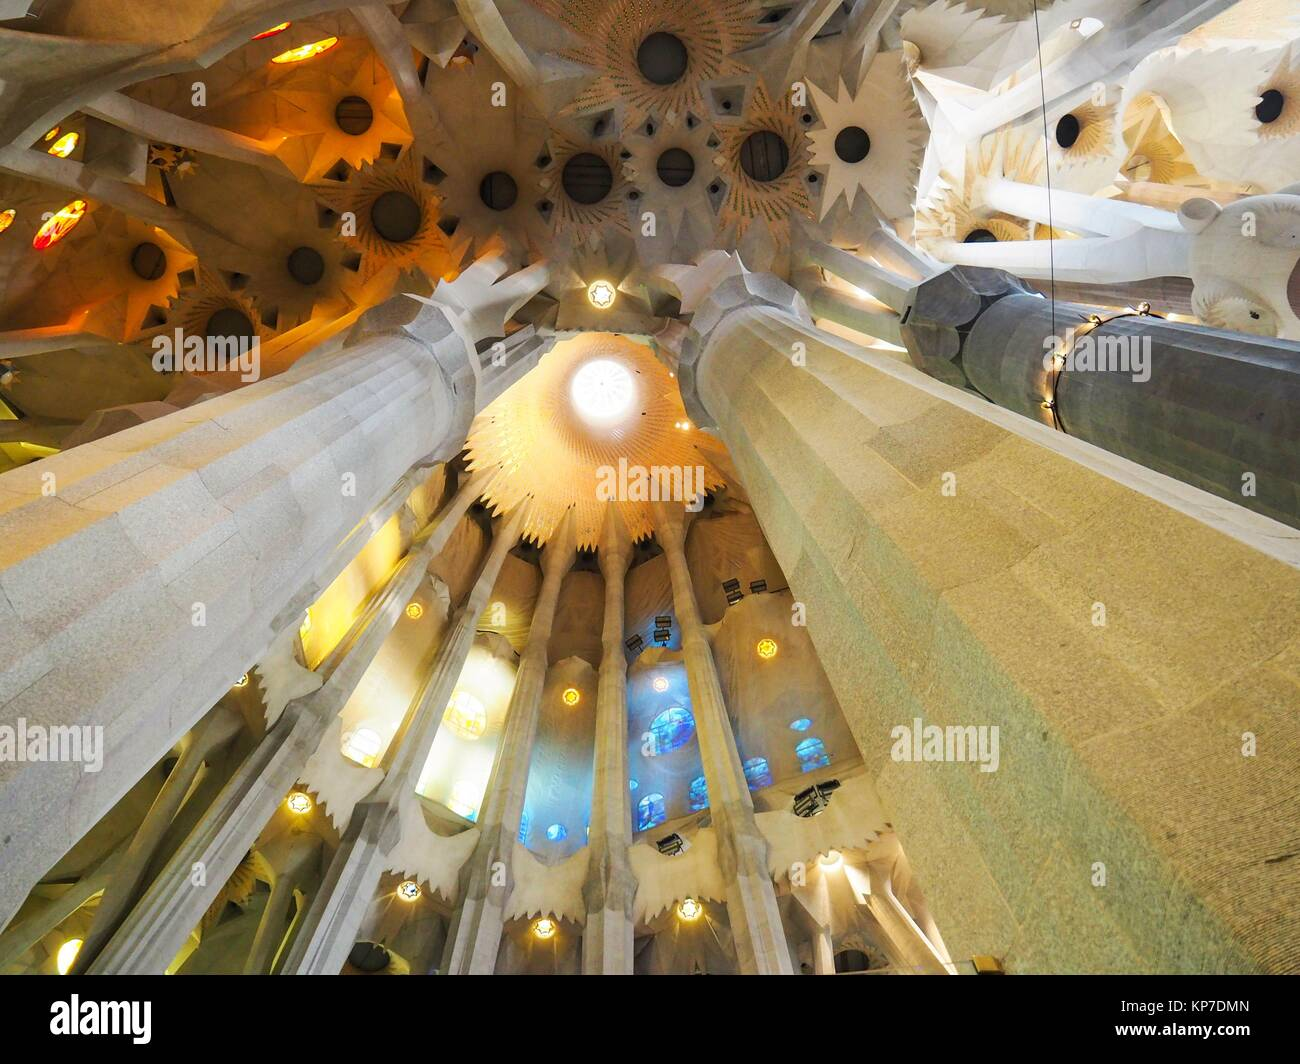 Europe, Spain, Barcelona, Sagrada Familia, Interior, Interiors, Gaudi, UNESCO, UNESCO World Heritage Sites, Tourism, - Stock Image